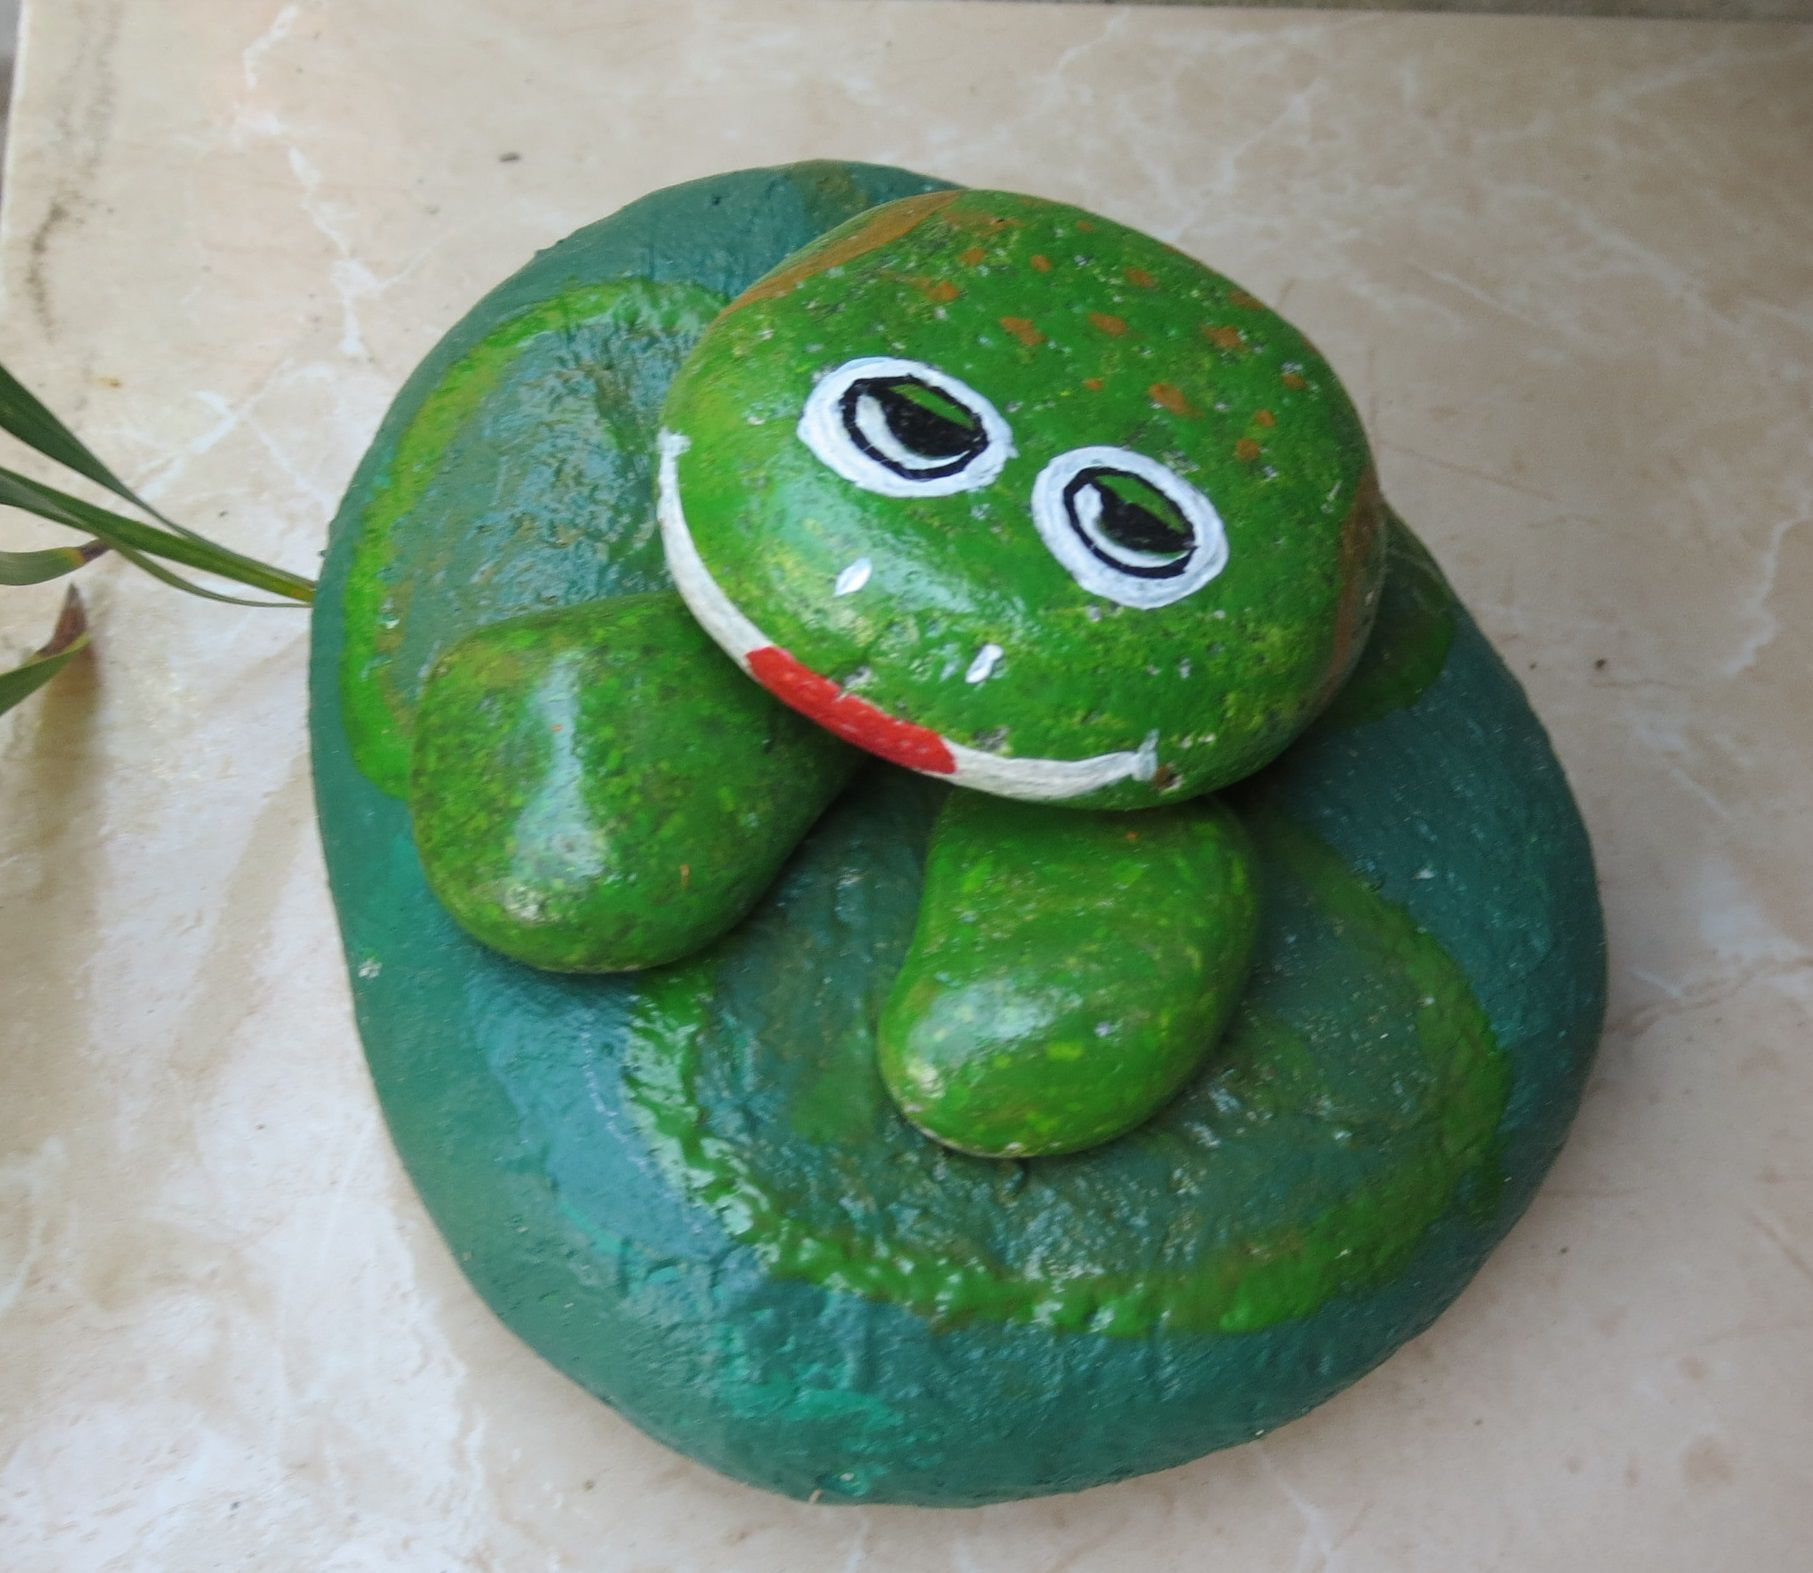 Sapo de piedra decorativo para jardin piedras - Piedras para jardin ...